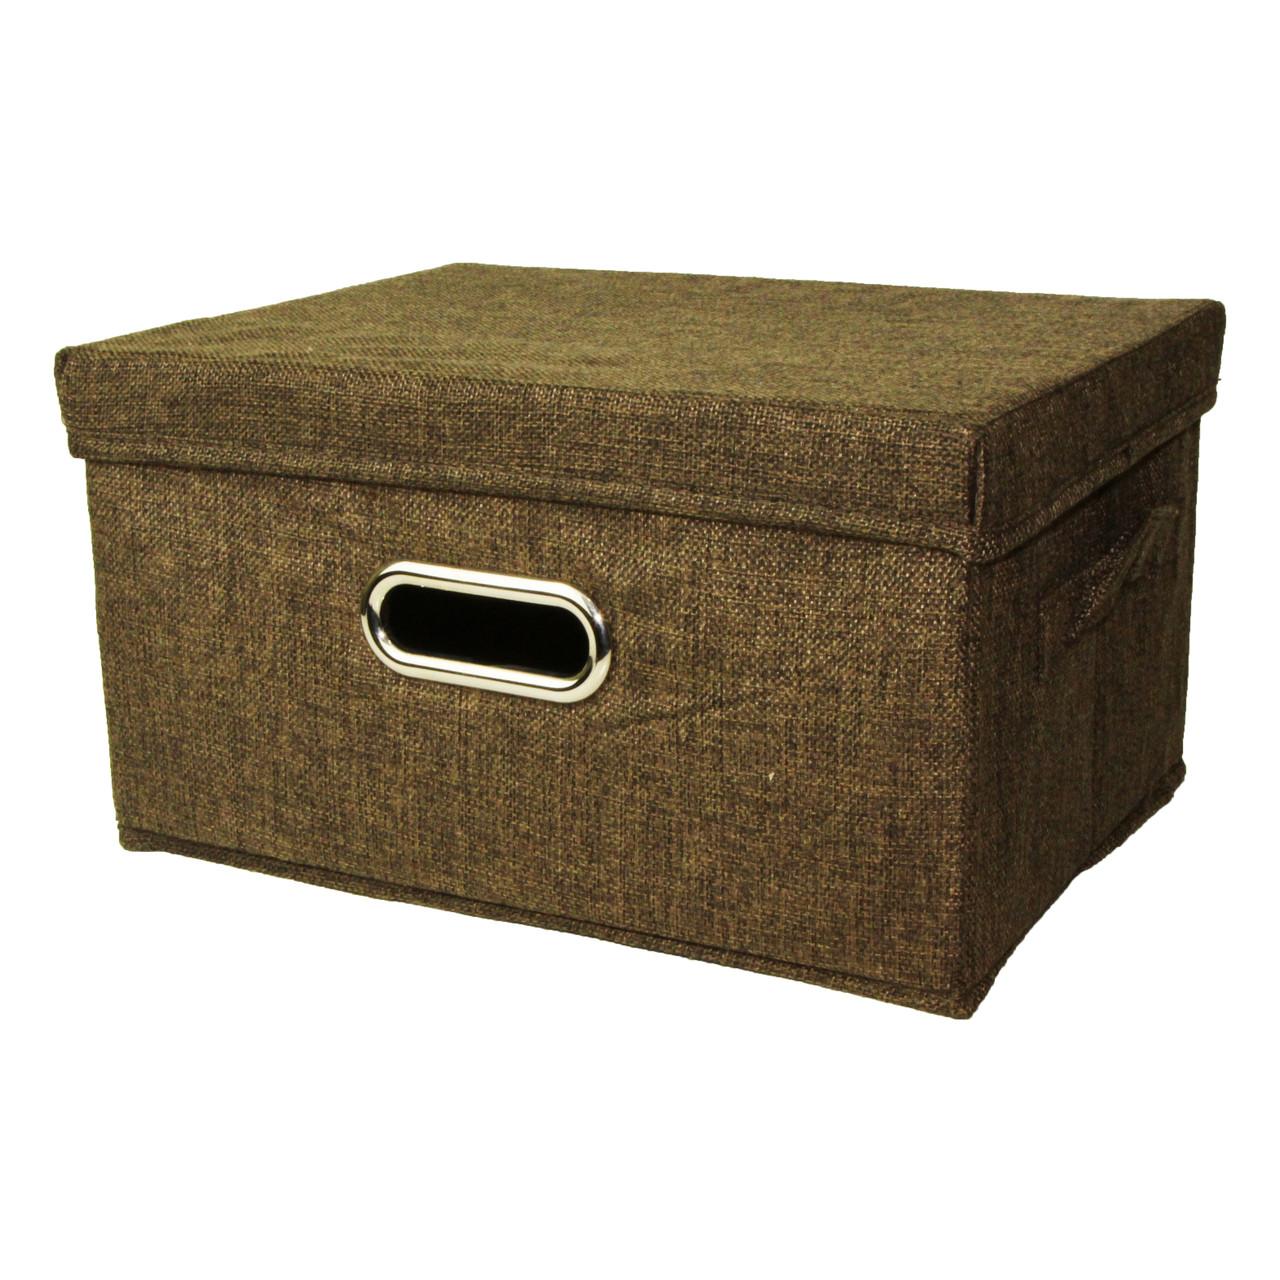 Корзина для игрушек MR 0339-1(Brown) ящик, коробка, 33-25-18см